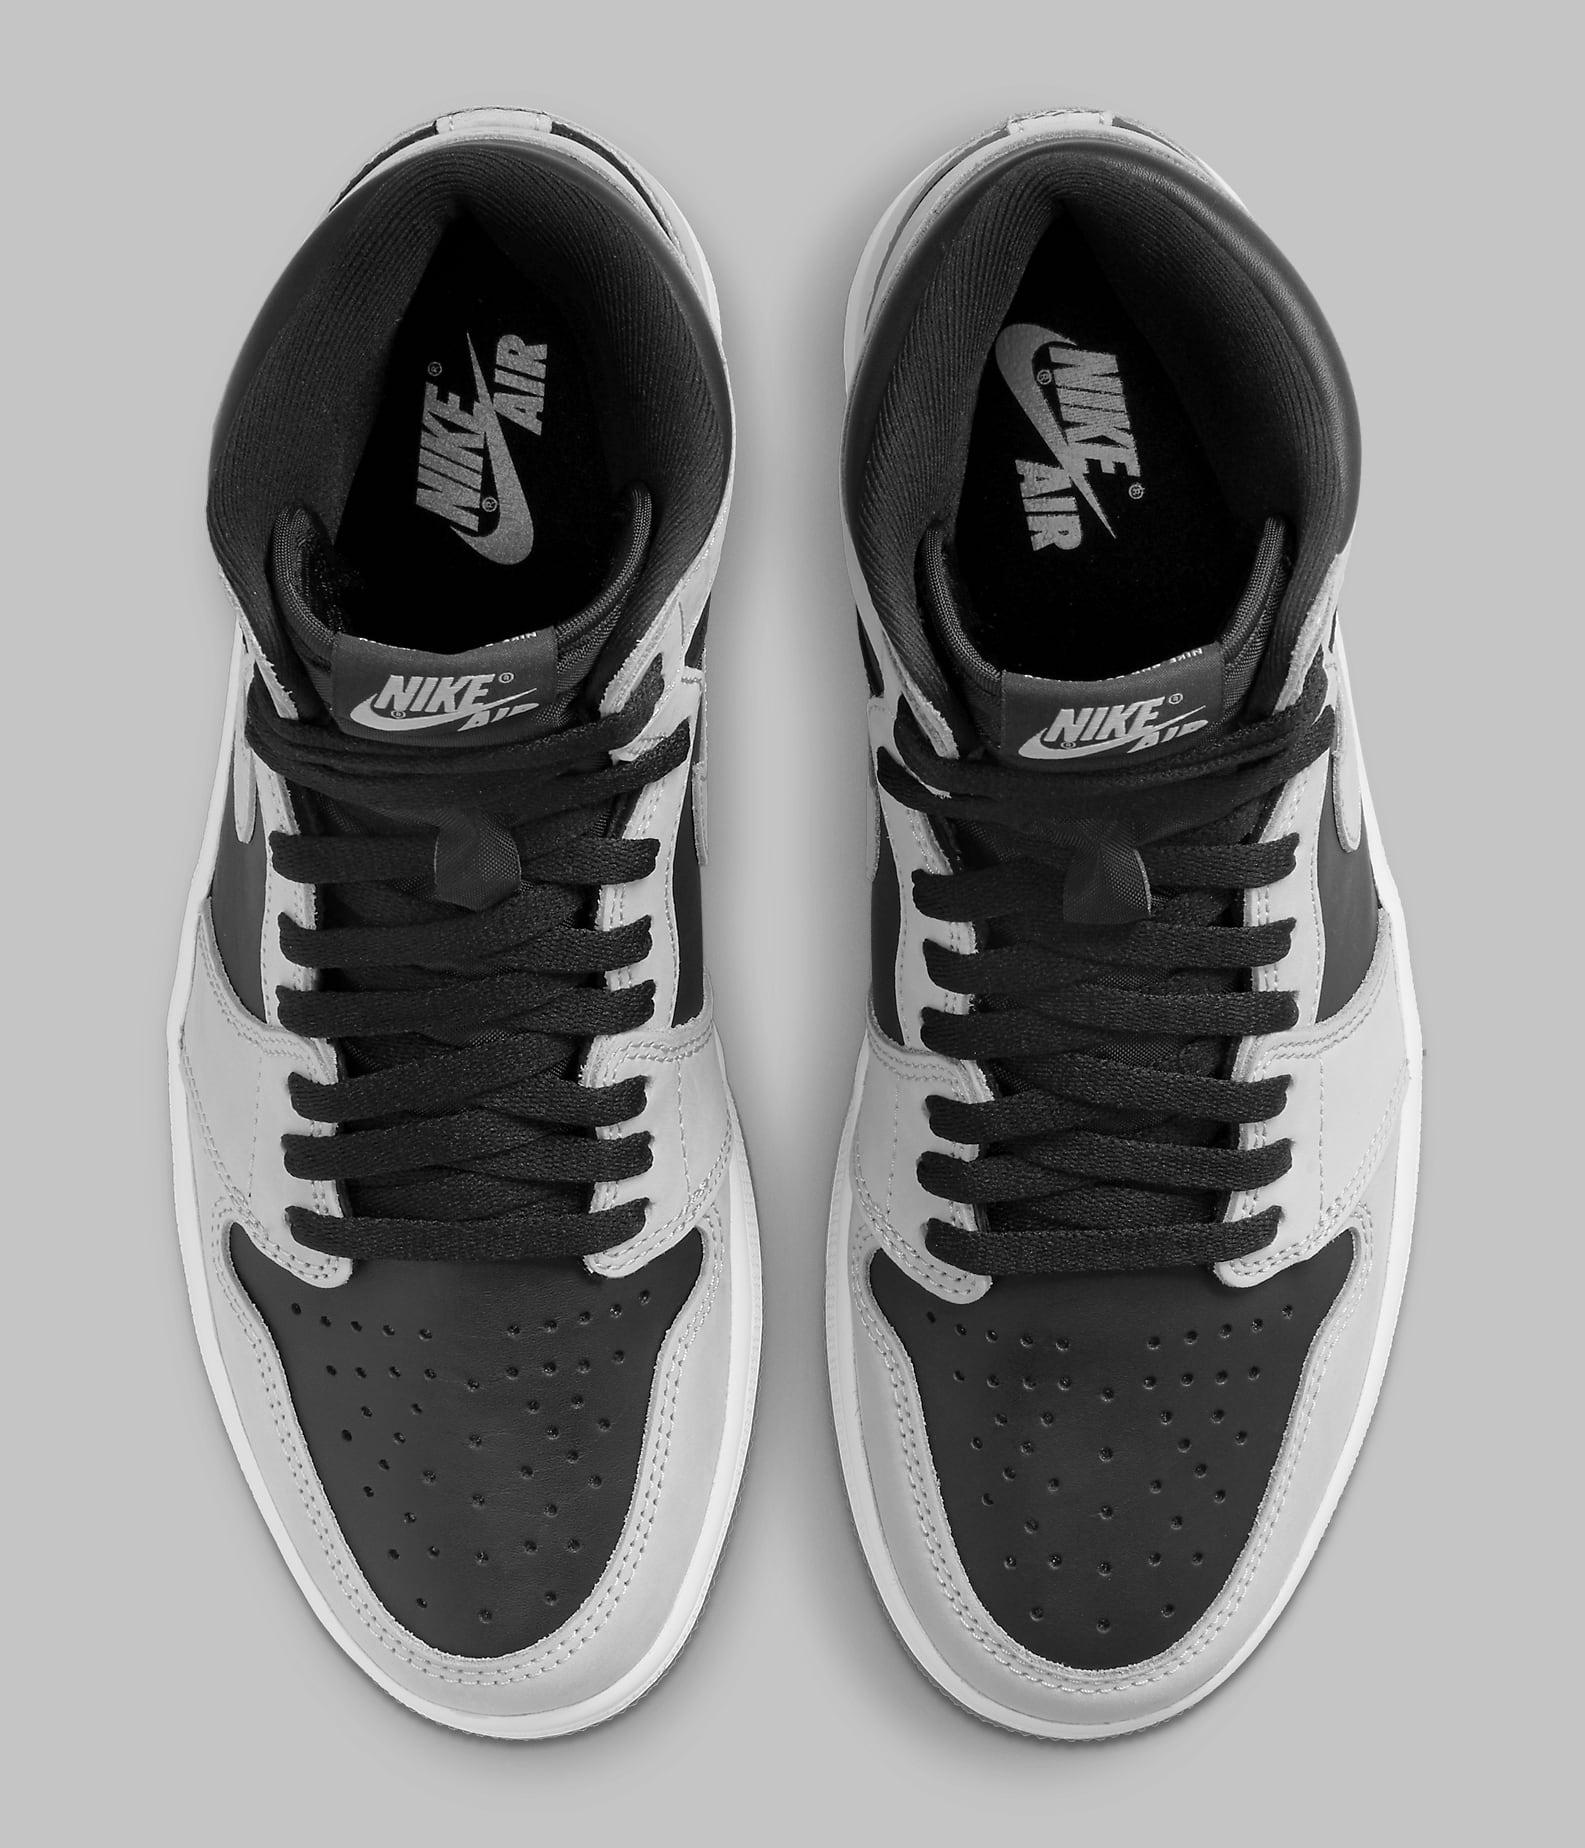 Air Jordan 1 Retro High OG 'Shadow 2.0' 555088-035 Top